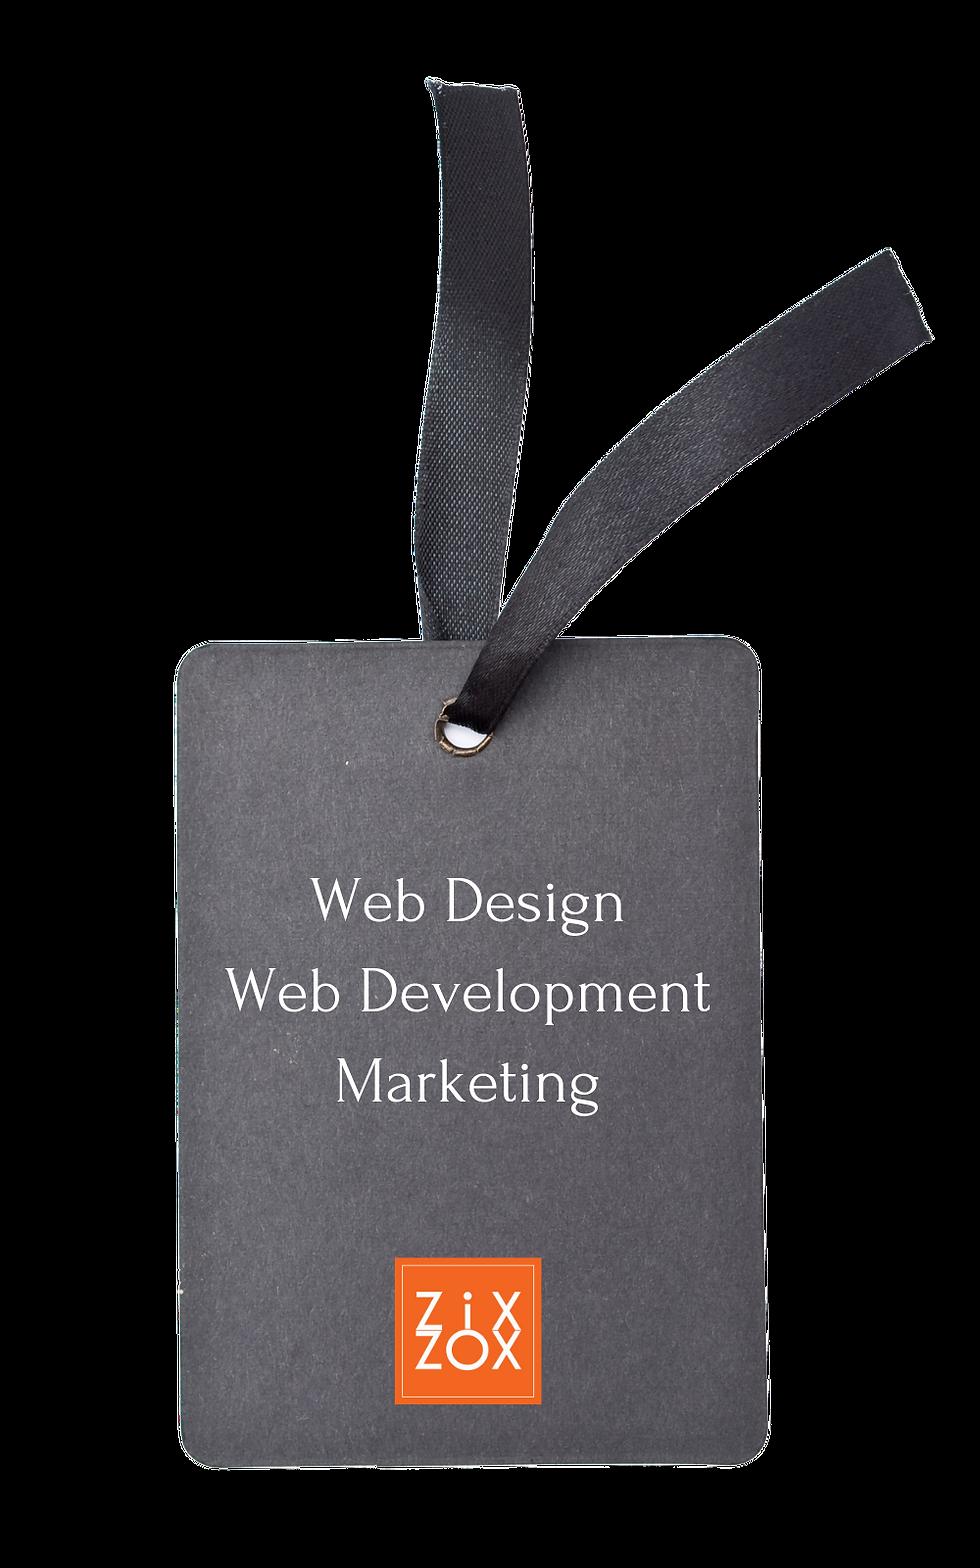 Web Design, Web Development Tag